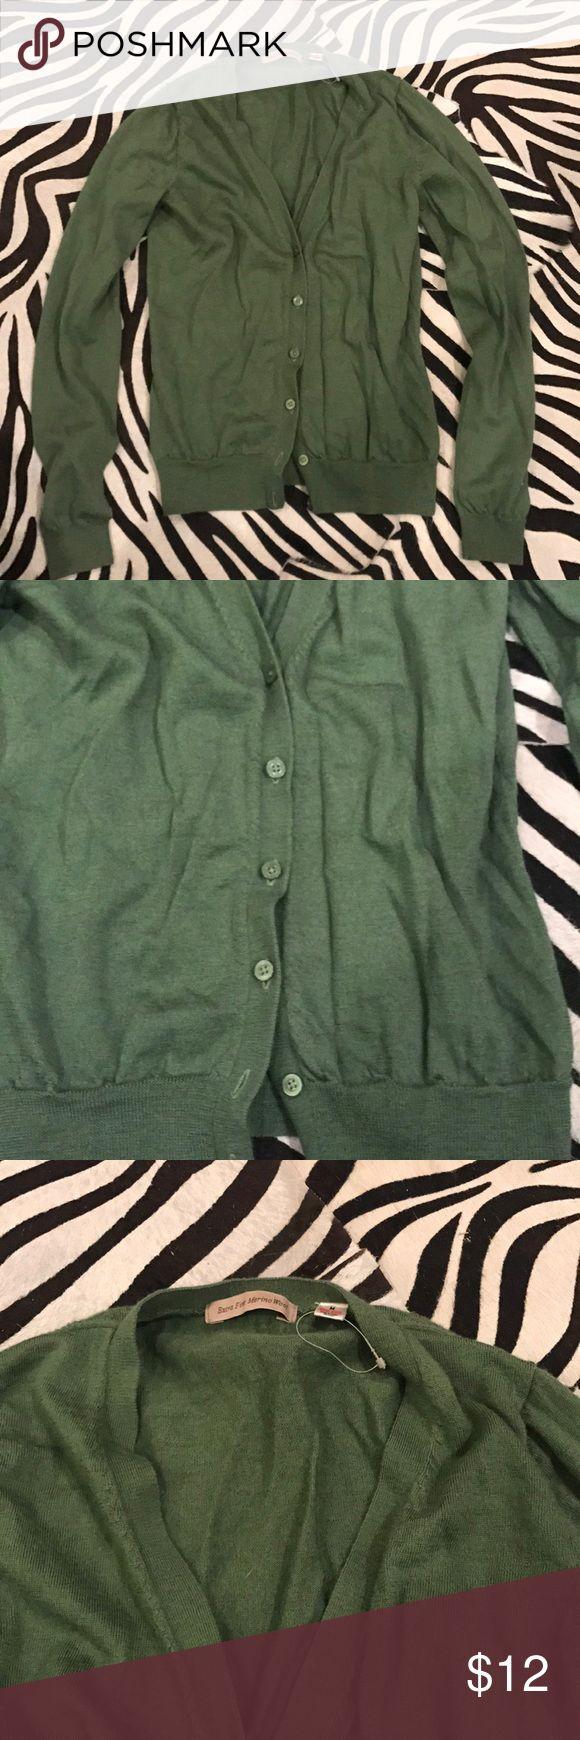 Uniqlo cardigan Merino wool olive green cardigan Uniqlo Sweaters Cardigans